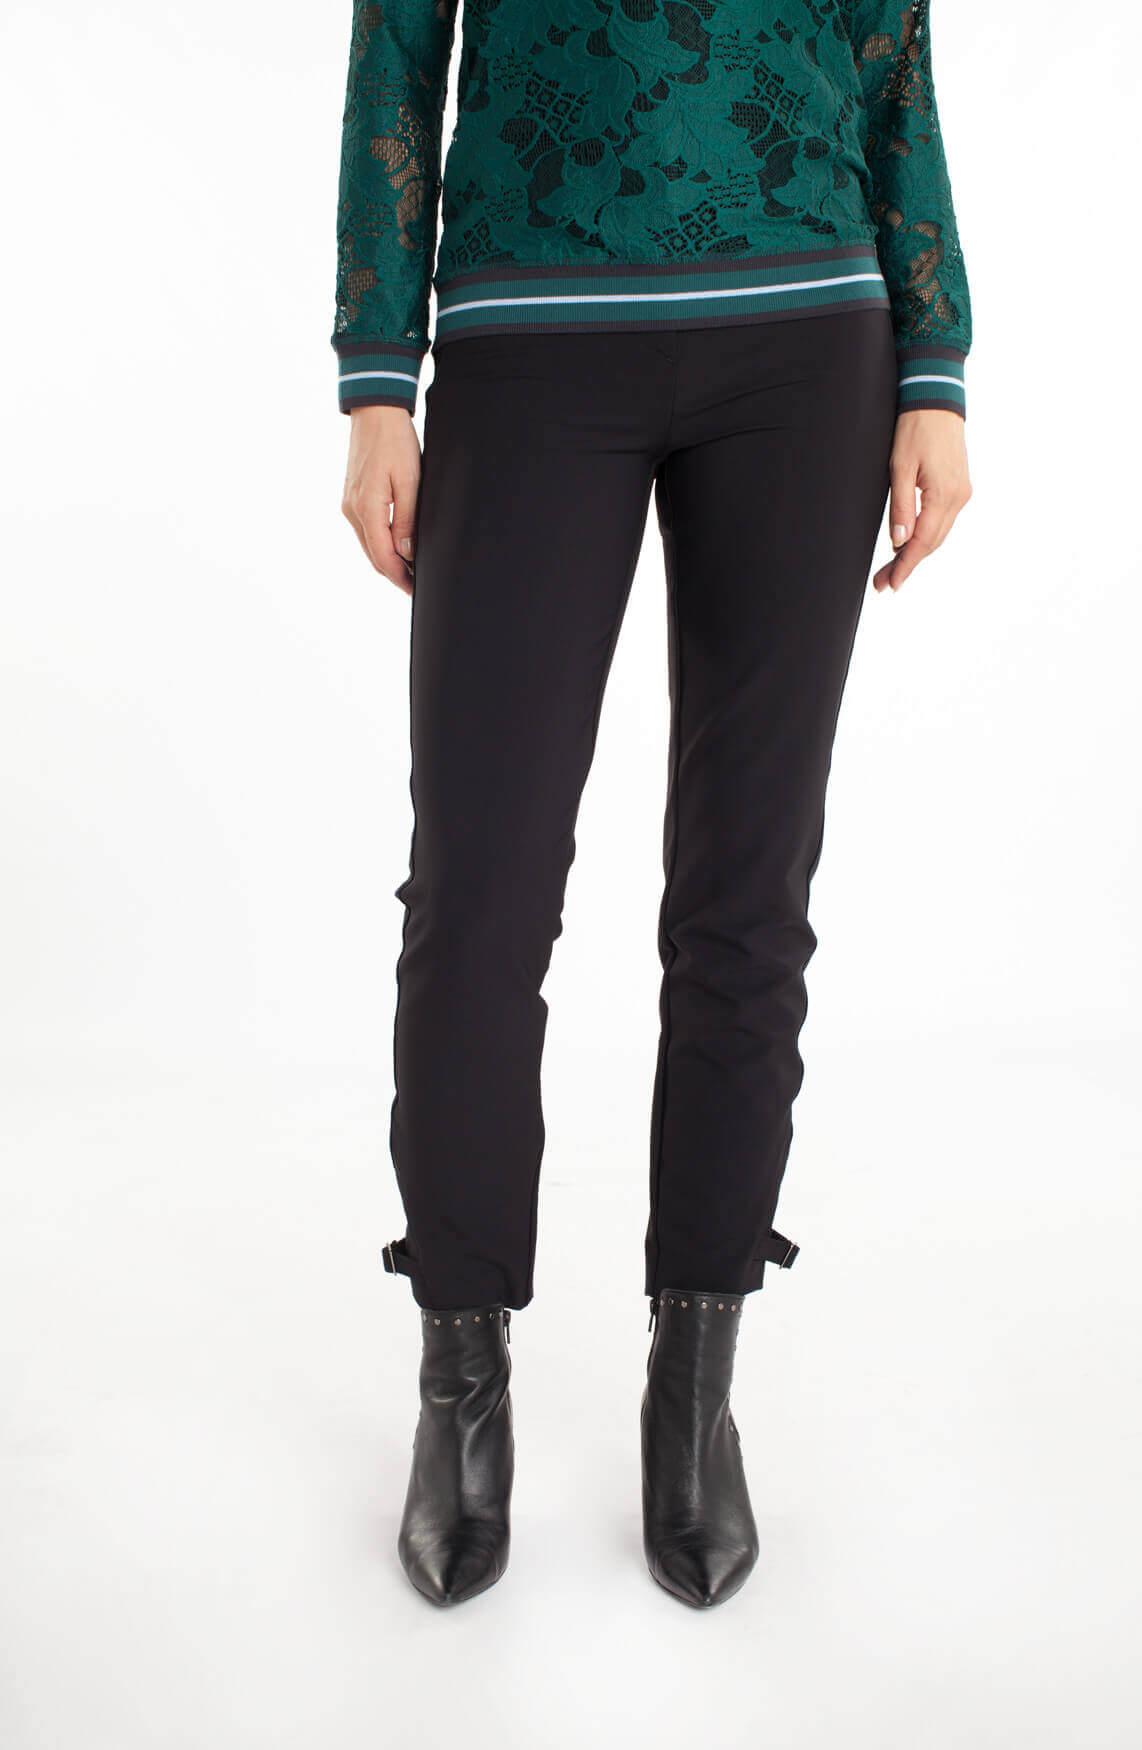 Rosner Dames Alisa pantalon met gespen zwart